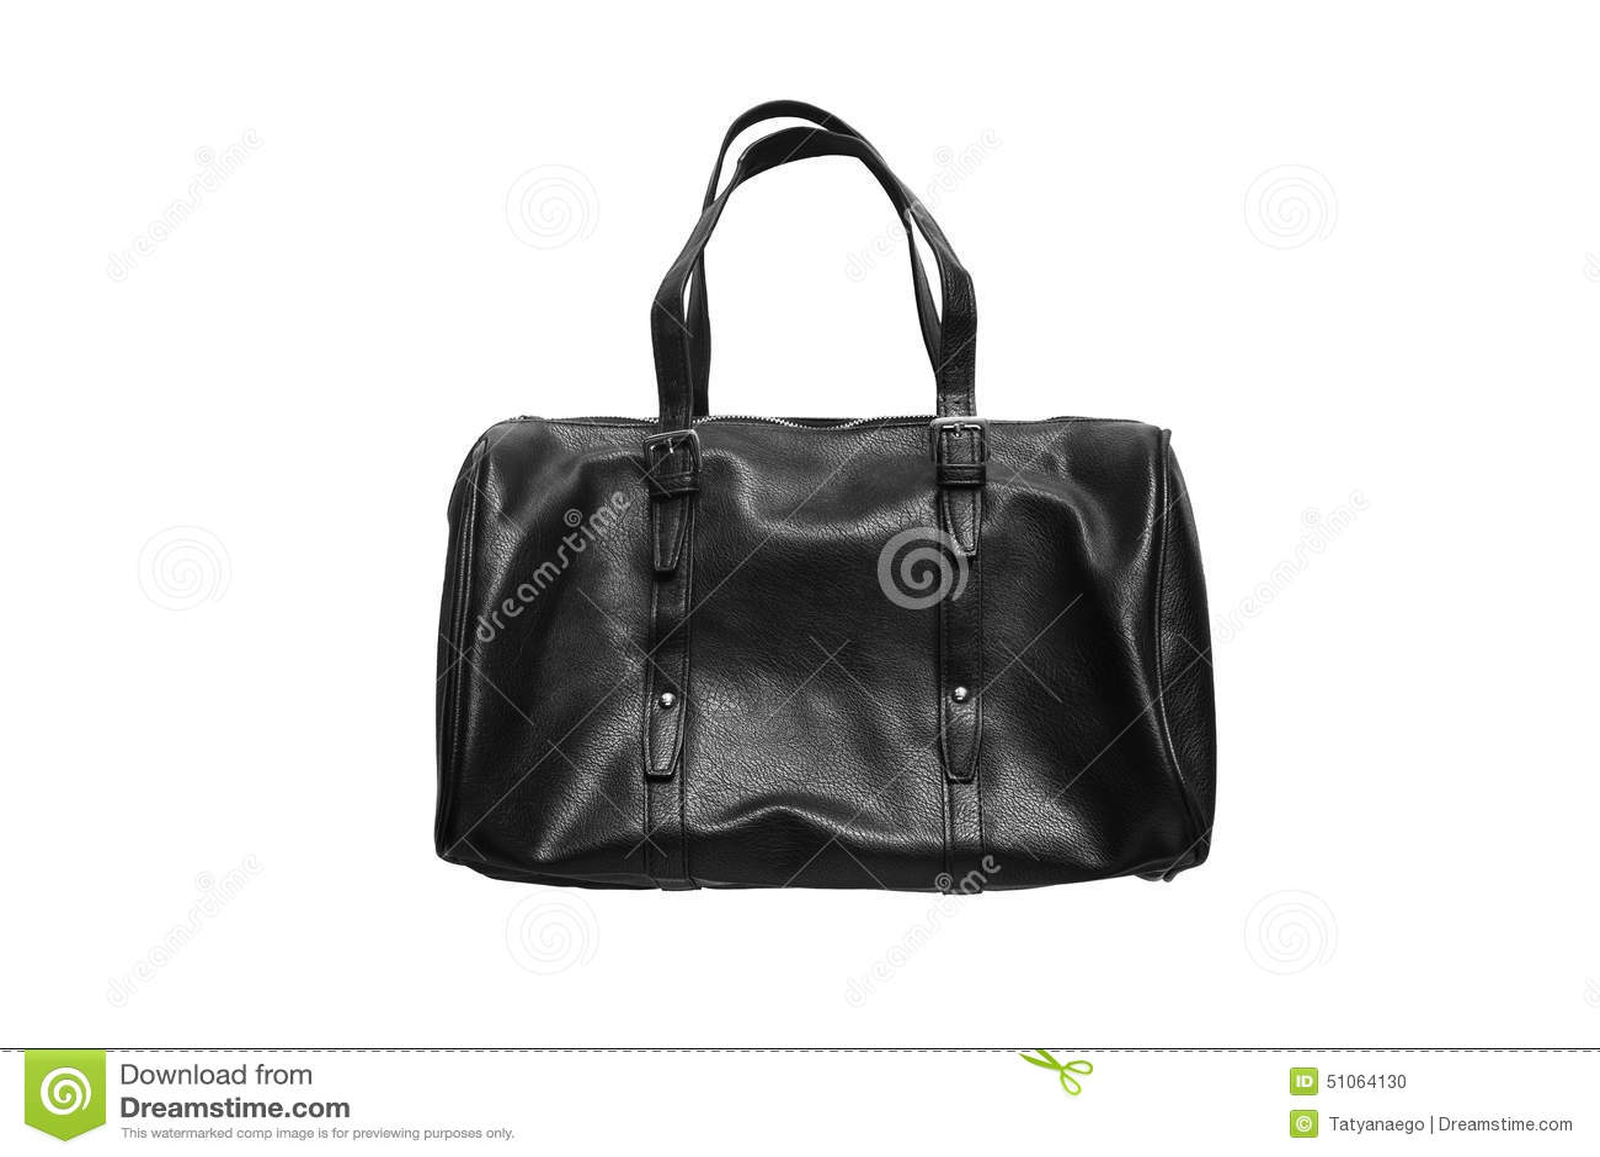 1a19104088 Μαύρη τσάντα μπόουλινγκ δέρματος που απομονώνεται πέρα από το λευκό